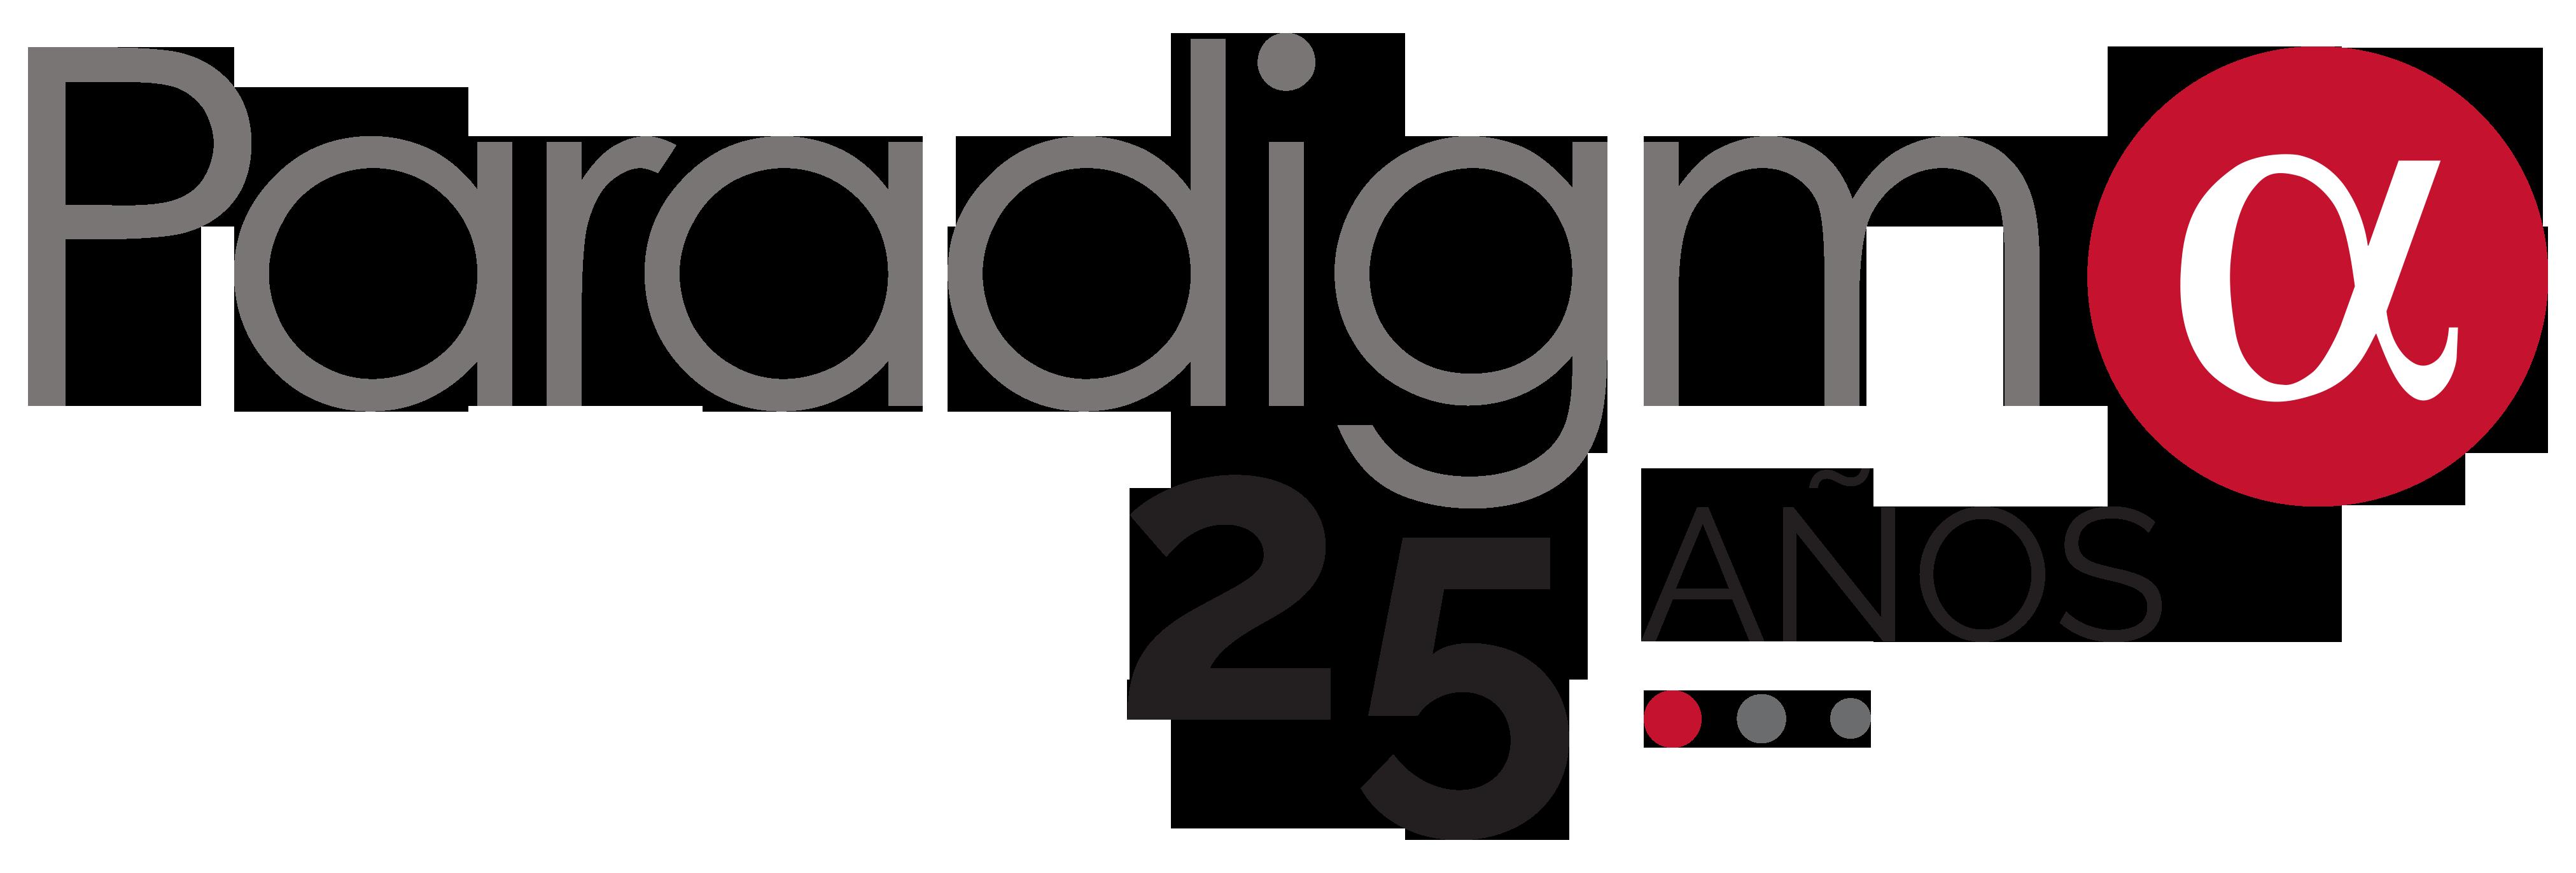 Logos_Paradigma25_Años_RGB